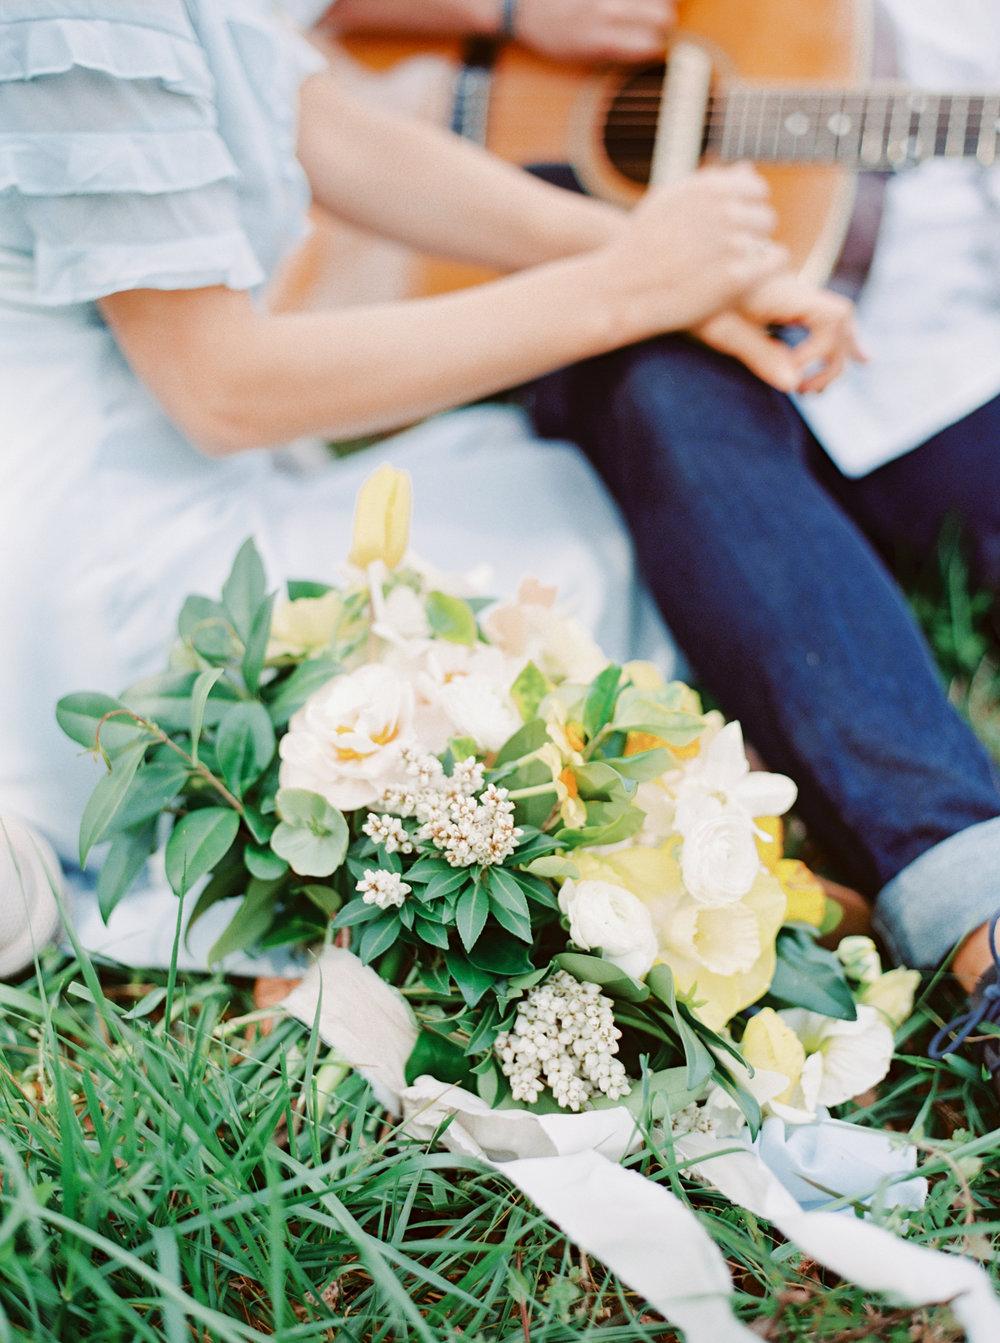 hannah forsberg atlanta wedding photographer whitney spence anniversary session with miniature donkeys and horse-17.jpg